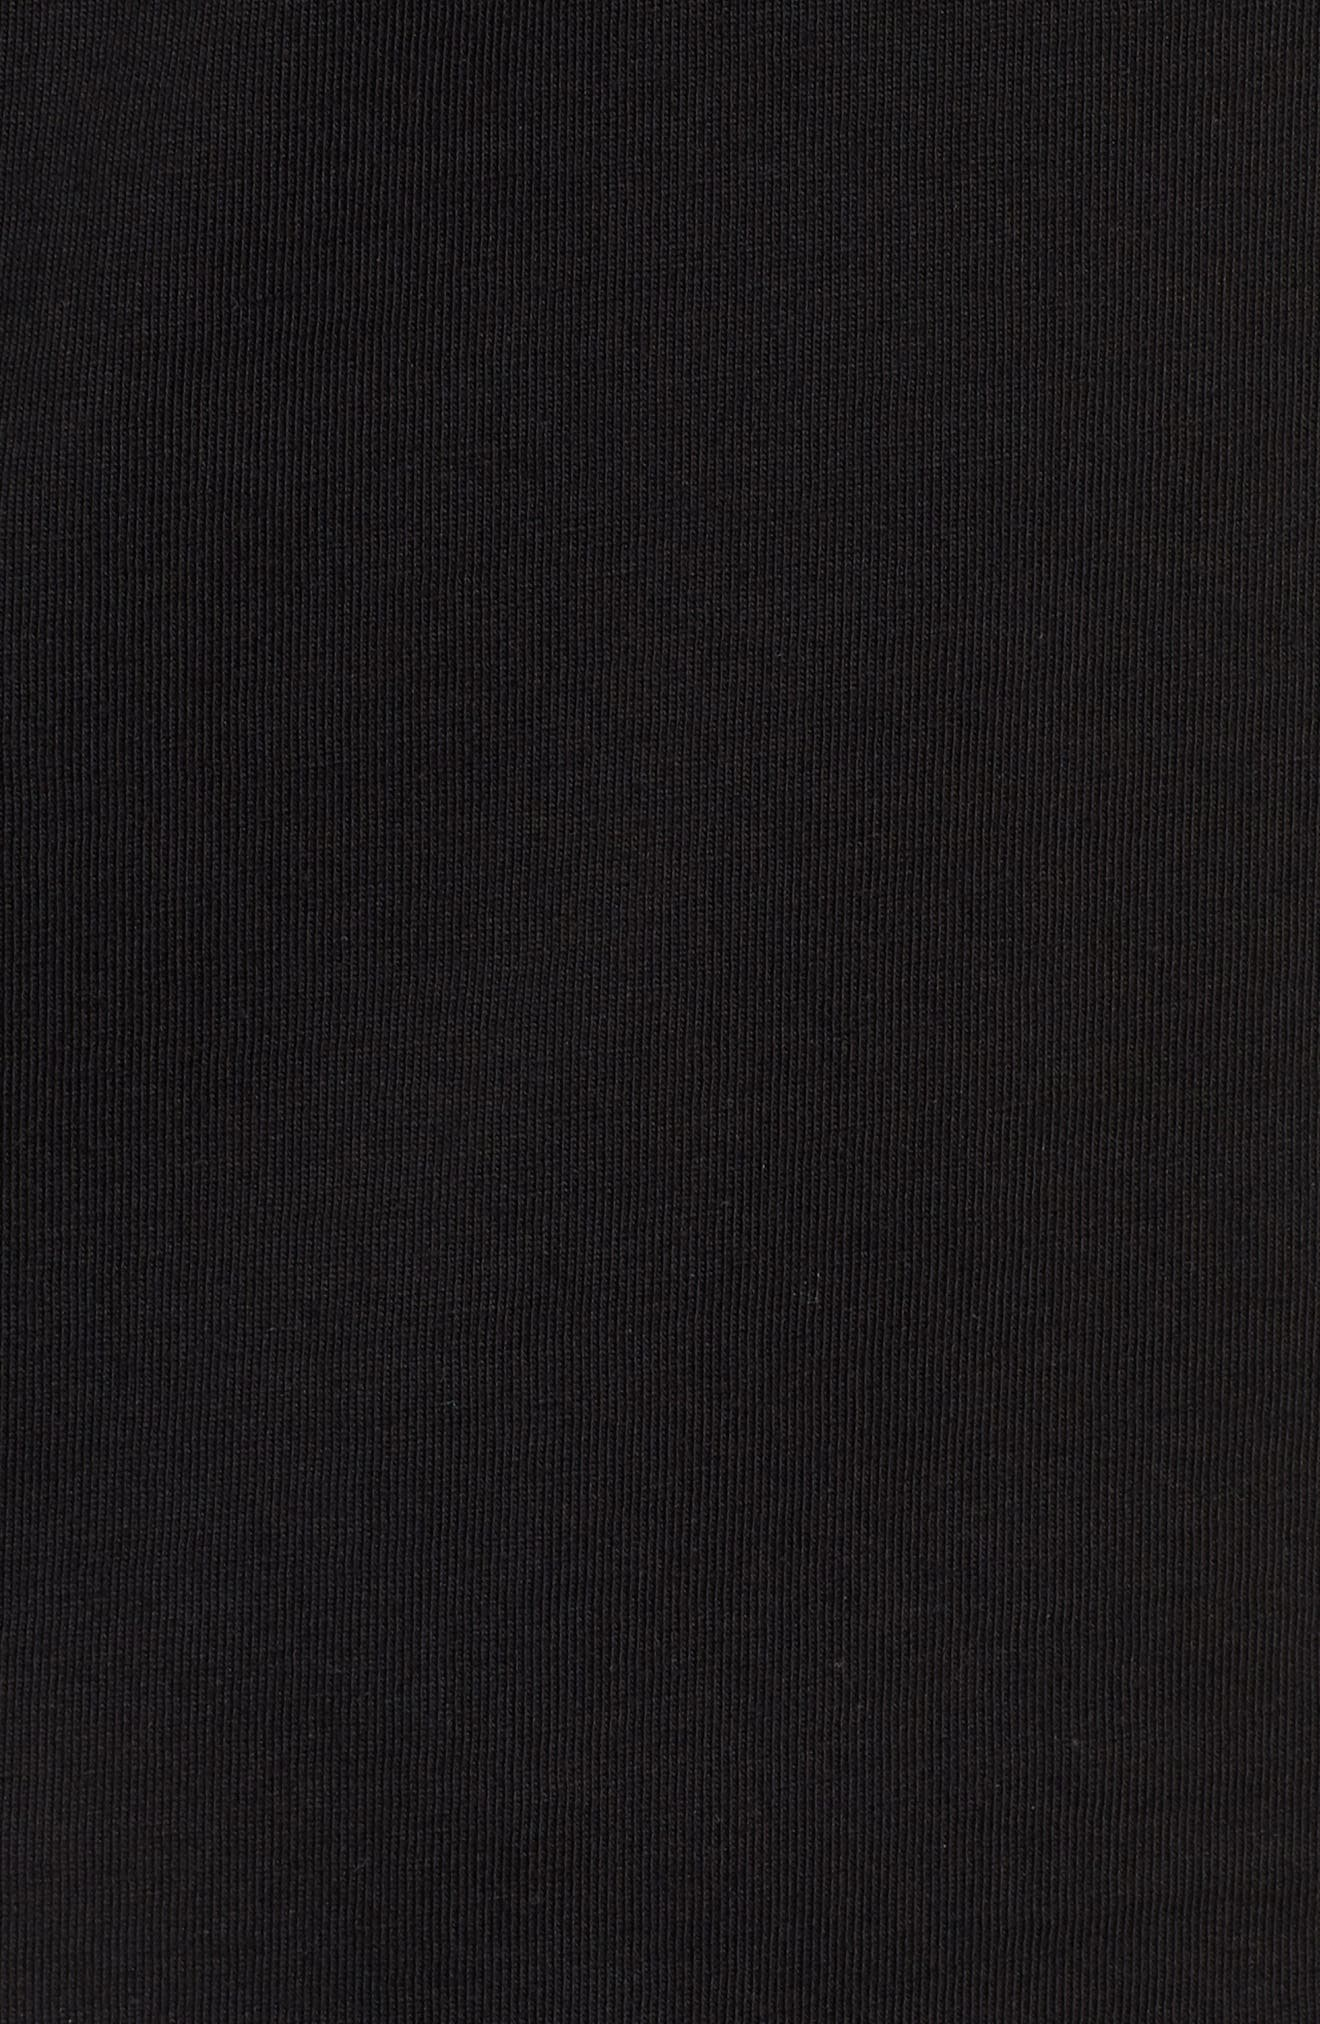 Super PUMA Allover Graphic Regular Fit T-Shirt,                             Alternate thumbnail 5, color,                             COTTON BLACK